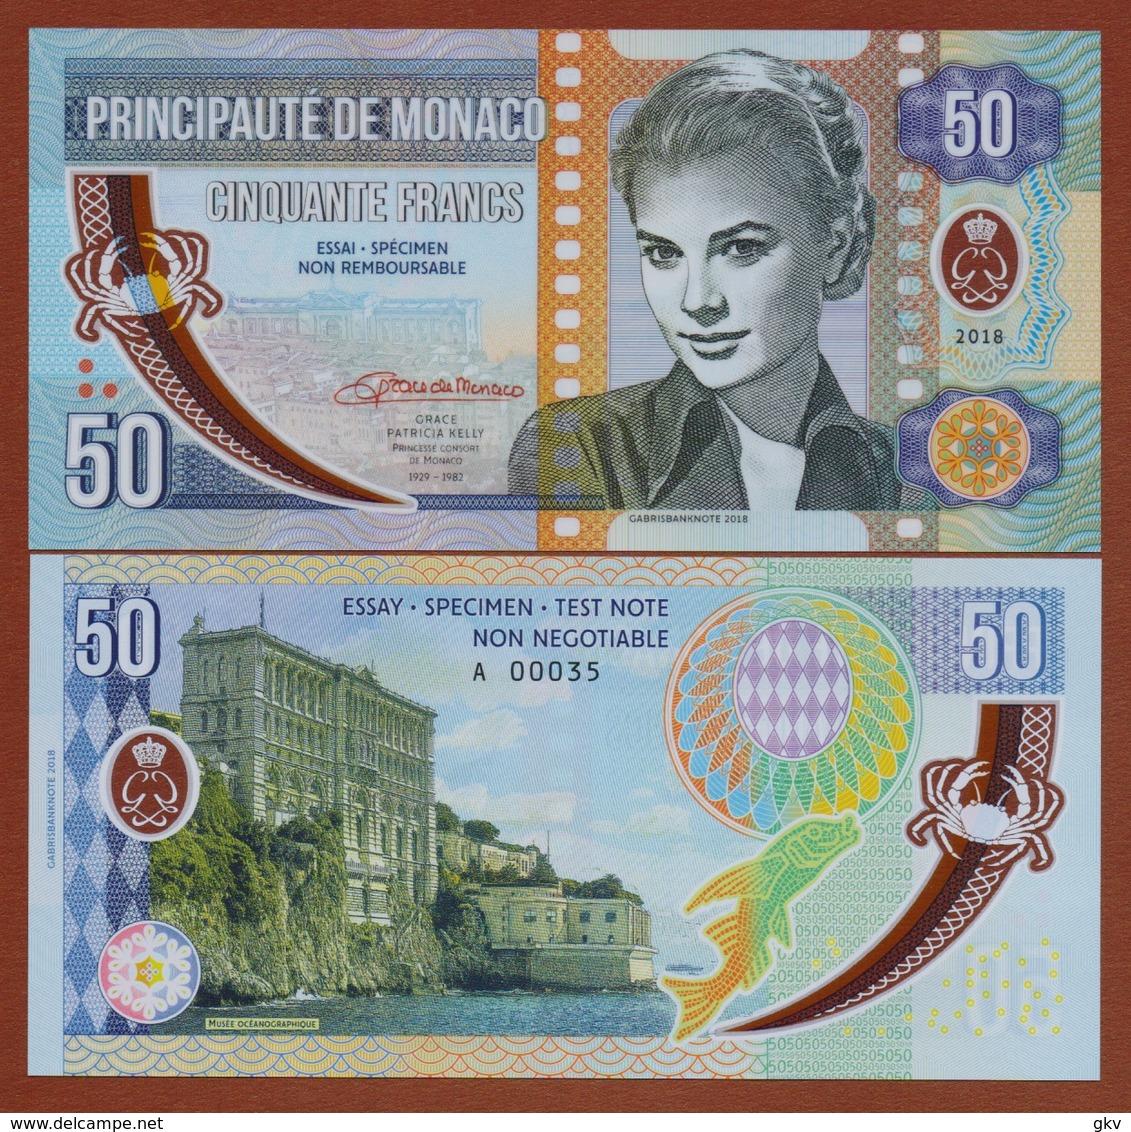 MONACO 50 Francs 2018 Polymer UNC. Grace Kelly. Private Essay. Specimen. - Billets